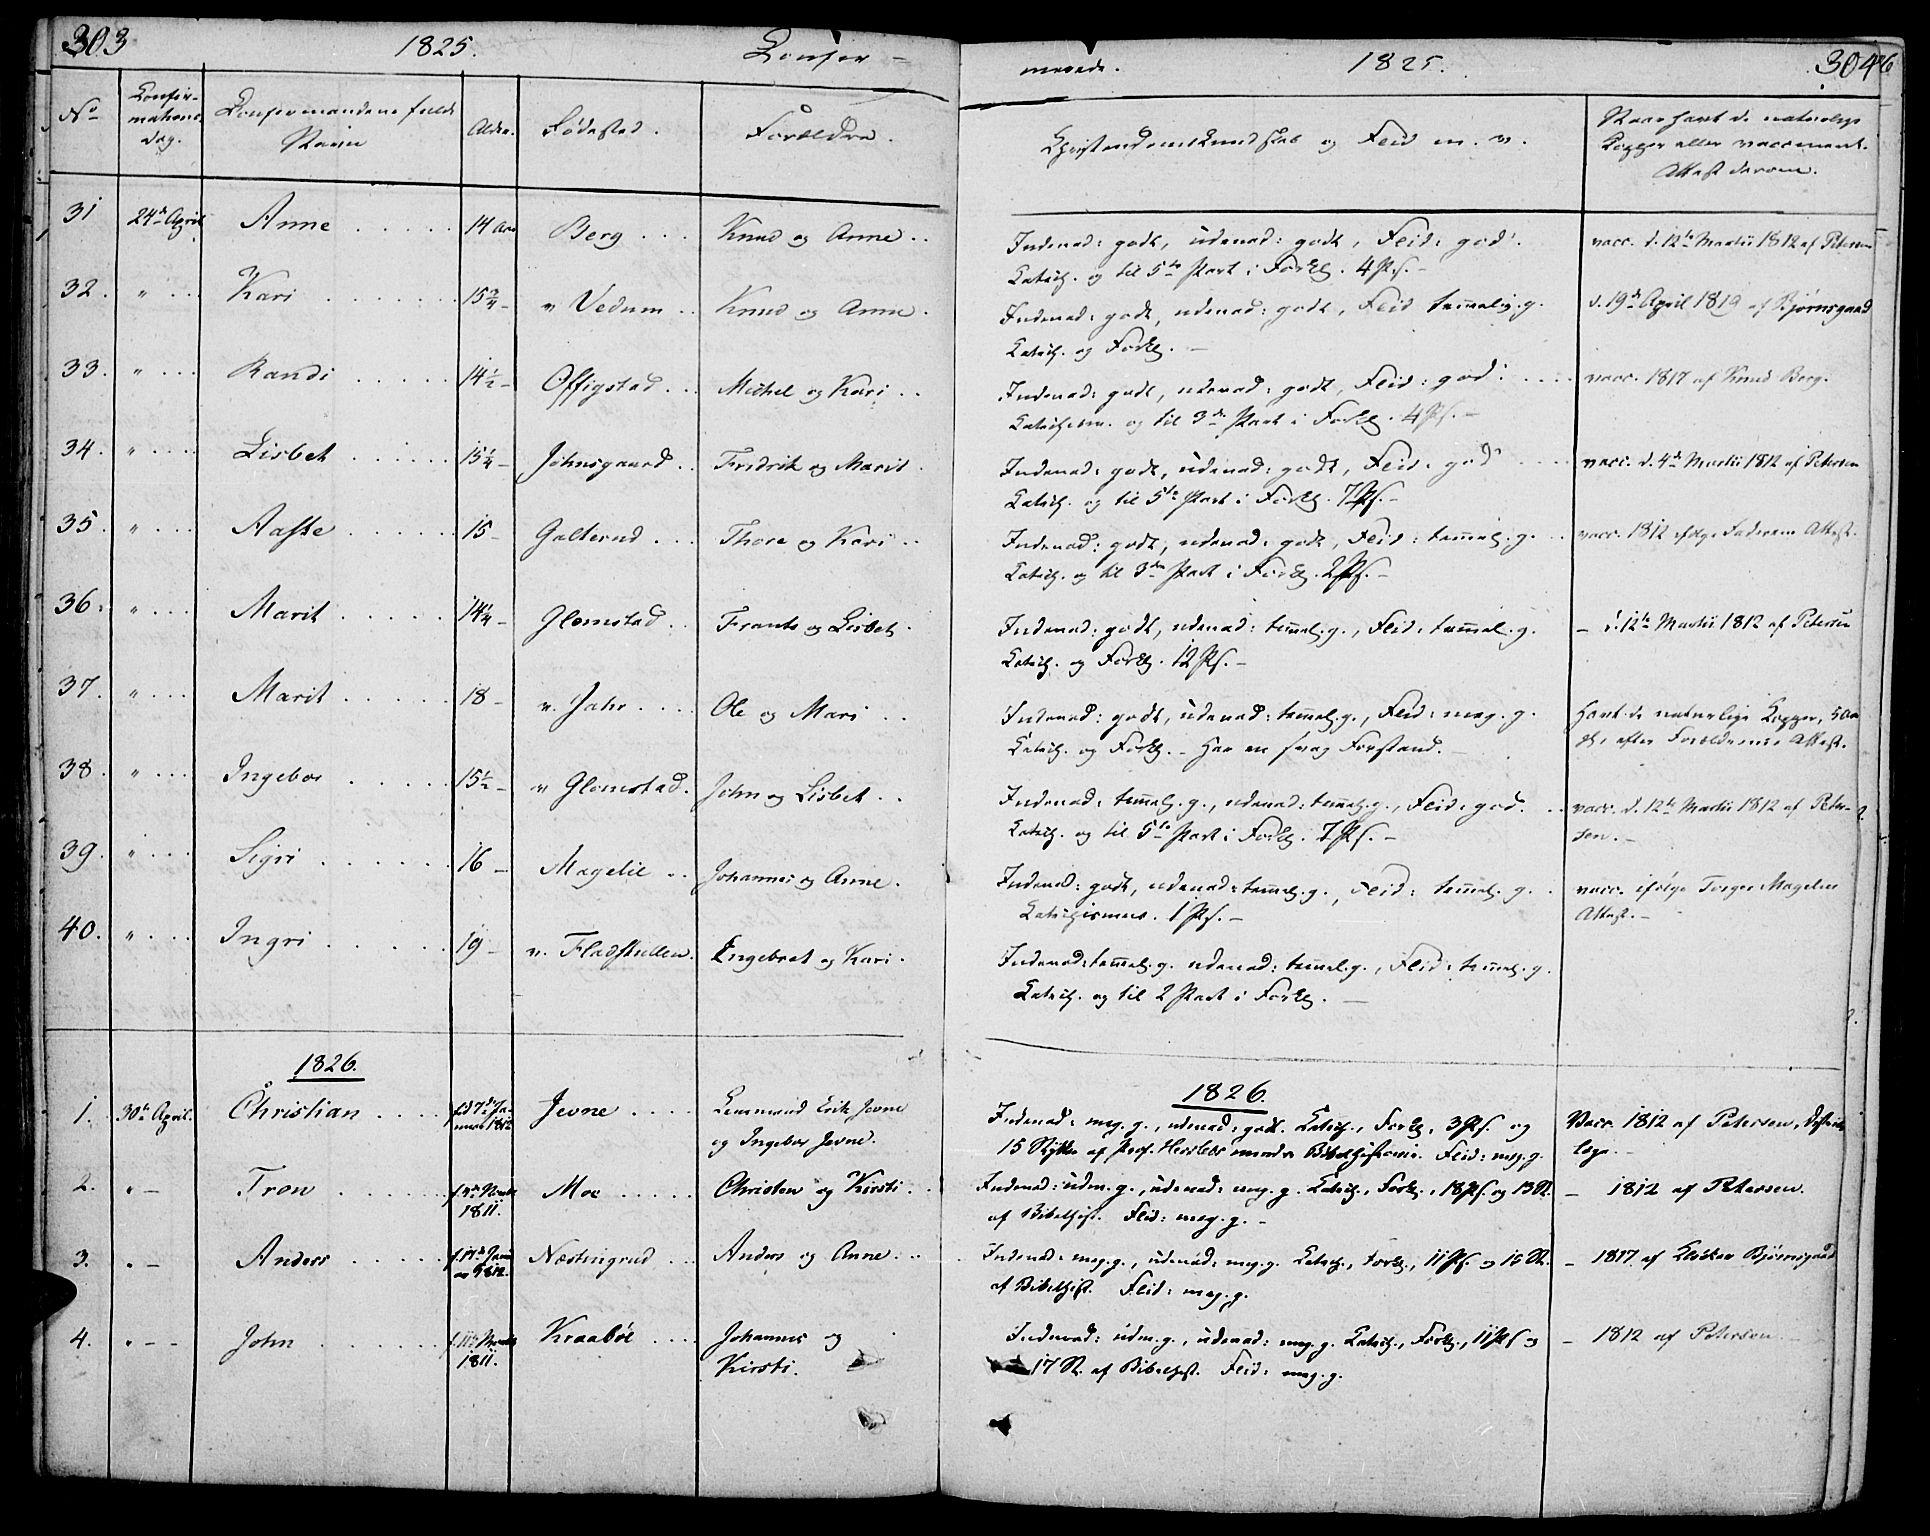 SAH, Øyer prestekontor, Ministerialbok nr. 4, 1824-1841, s. 303-304